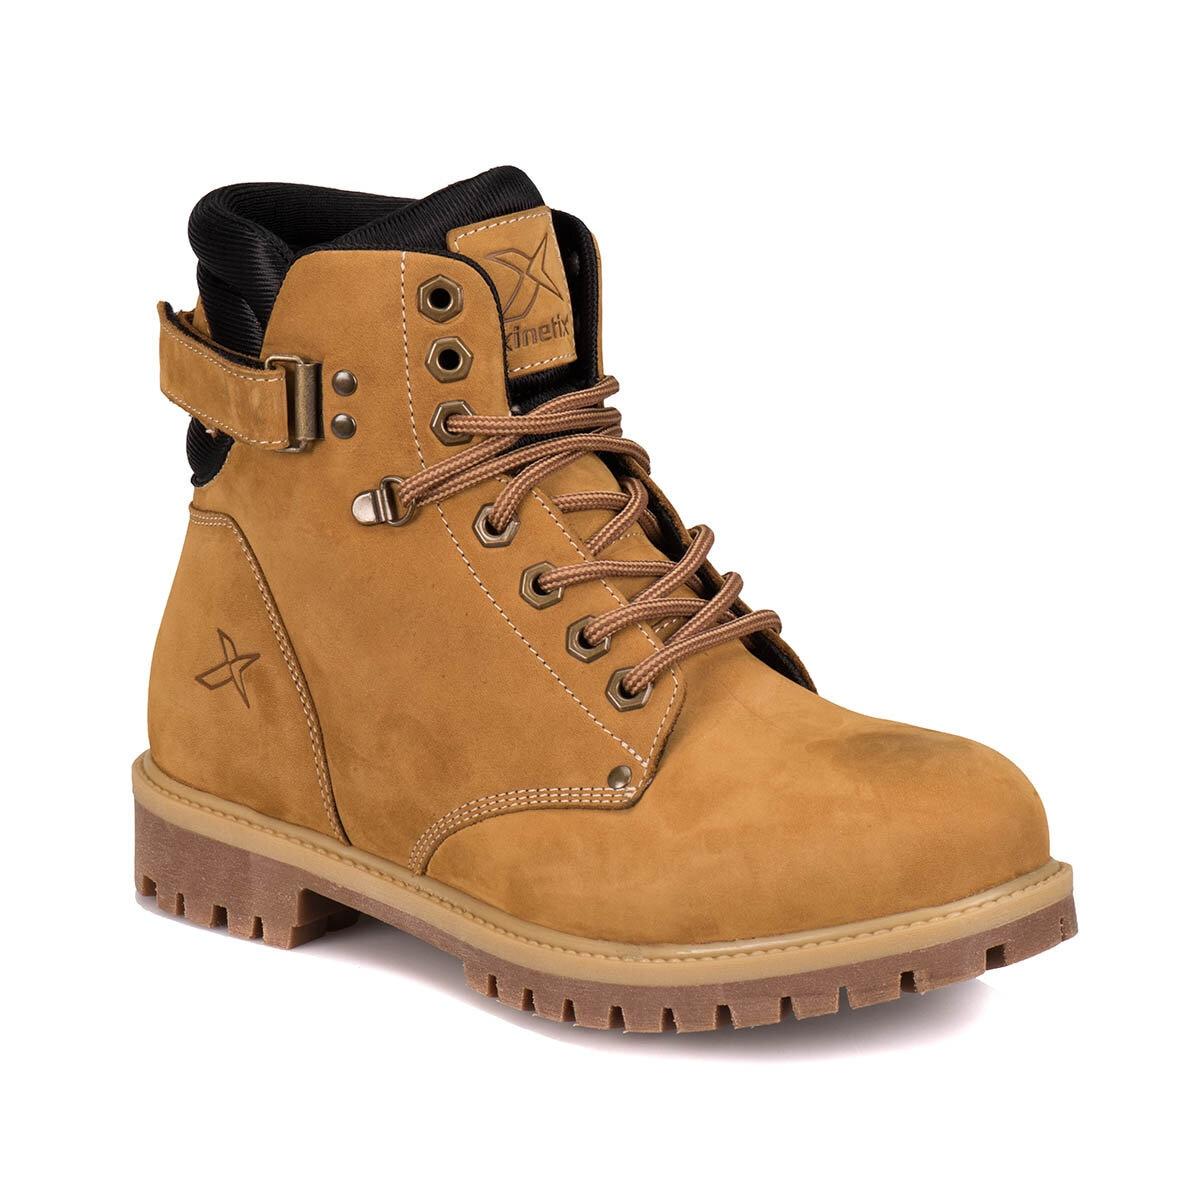 FLO A1305049 botas amarillas para hombre KINETIX